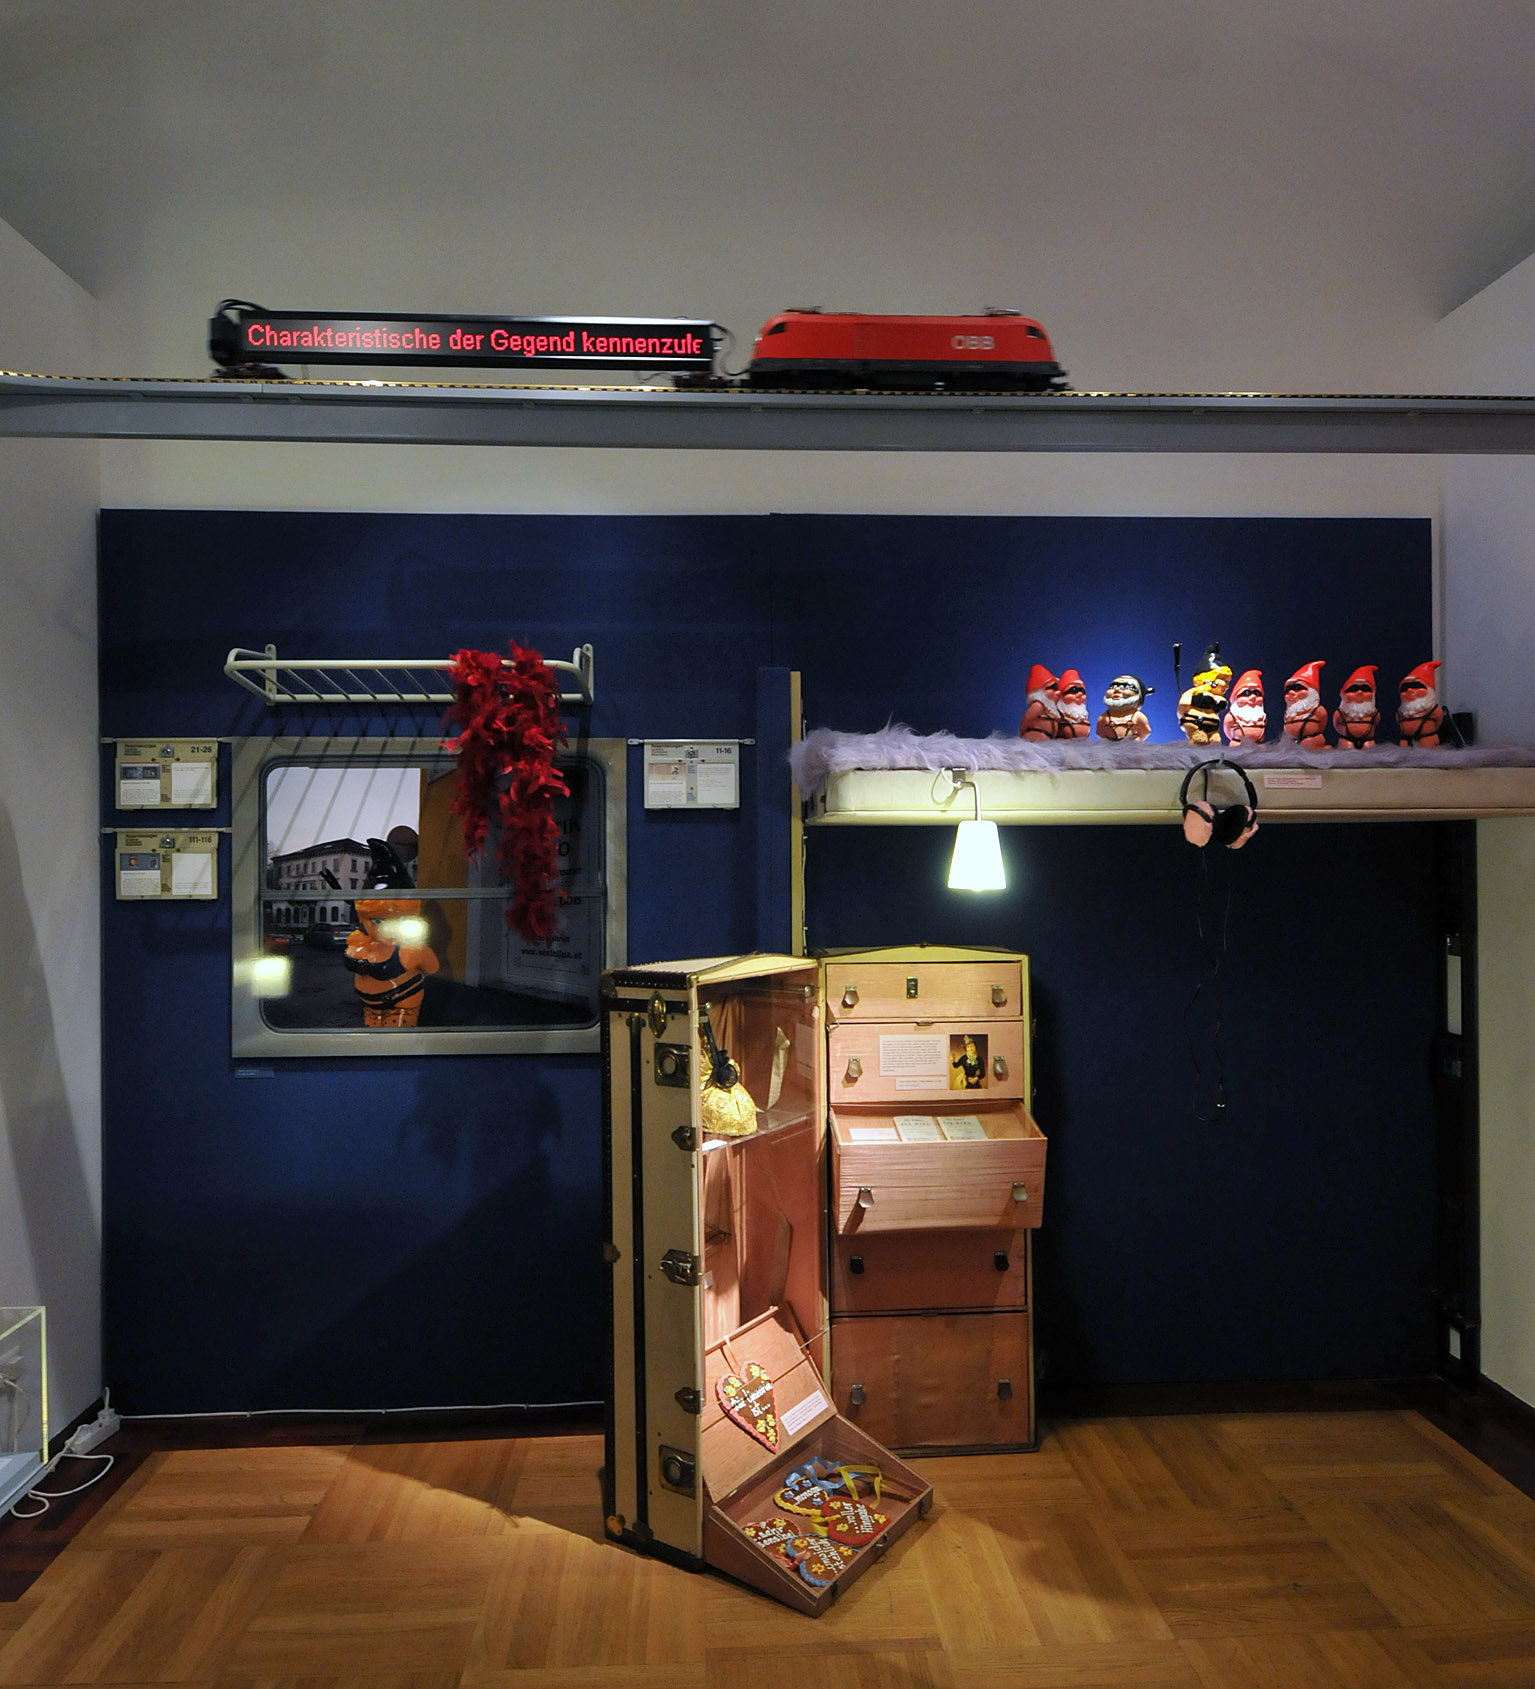 alex groh bilder news infos aus dem web. Black Bedroom Furniture Sets. Home Design Ideas